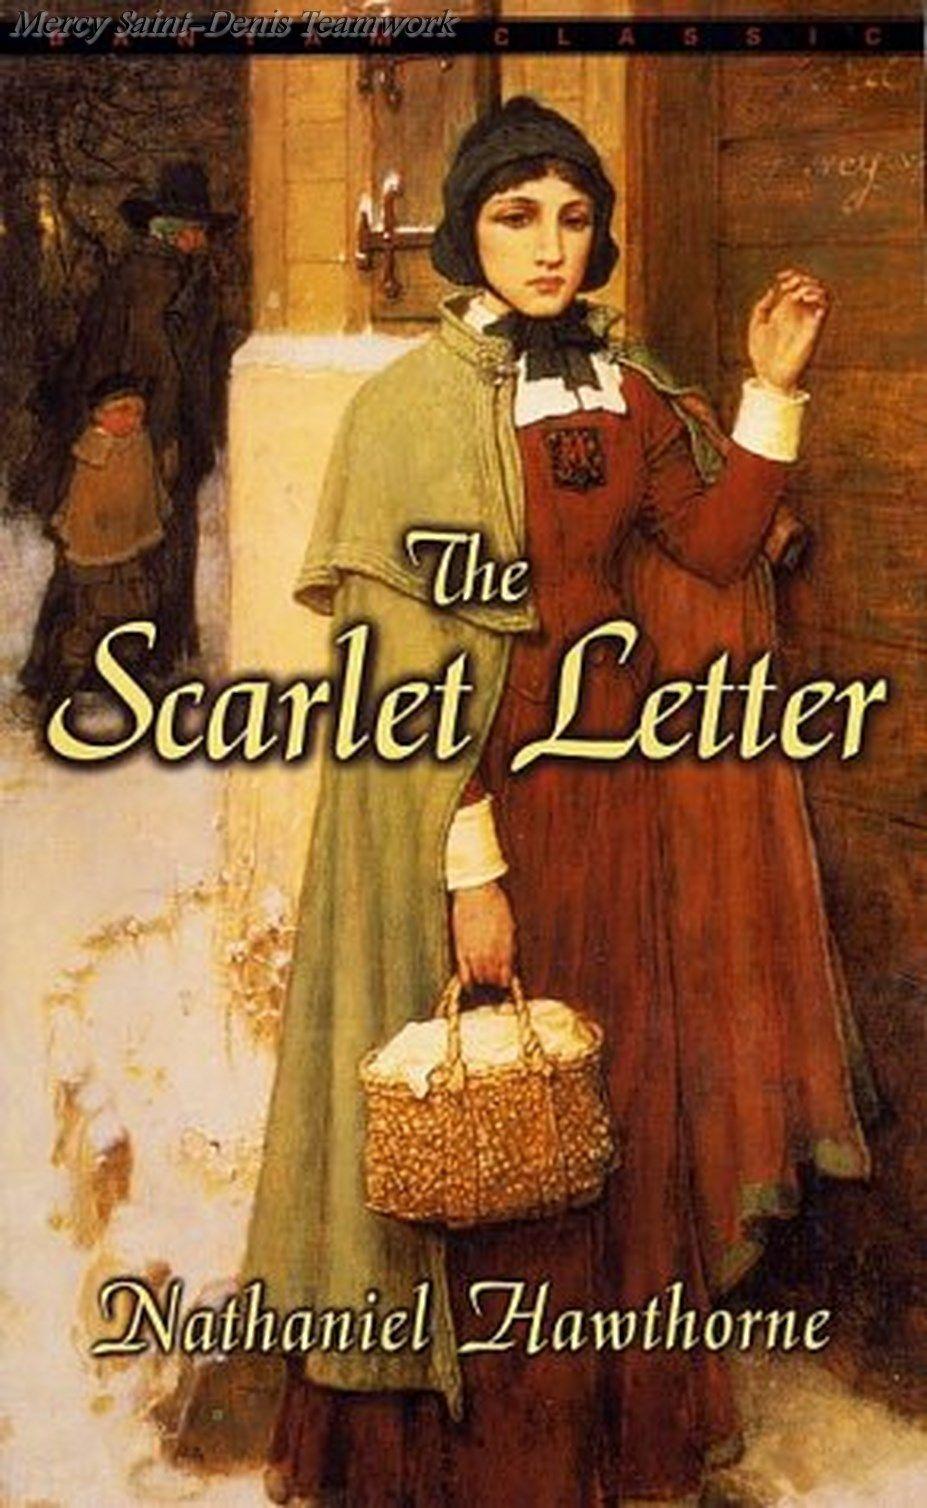 The Scarlet Letter Nathaniel Hawthorne. American